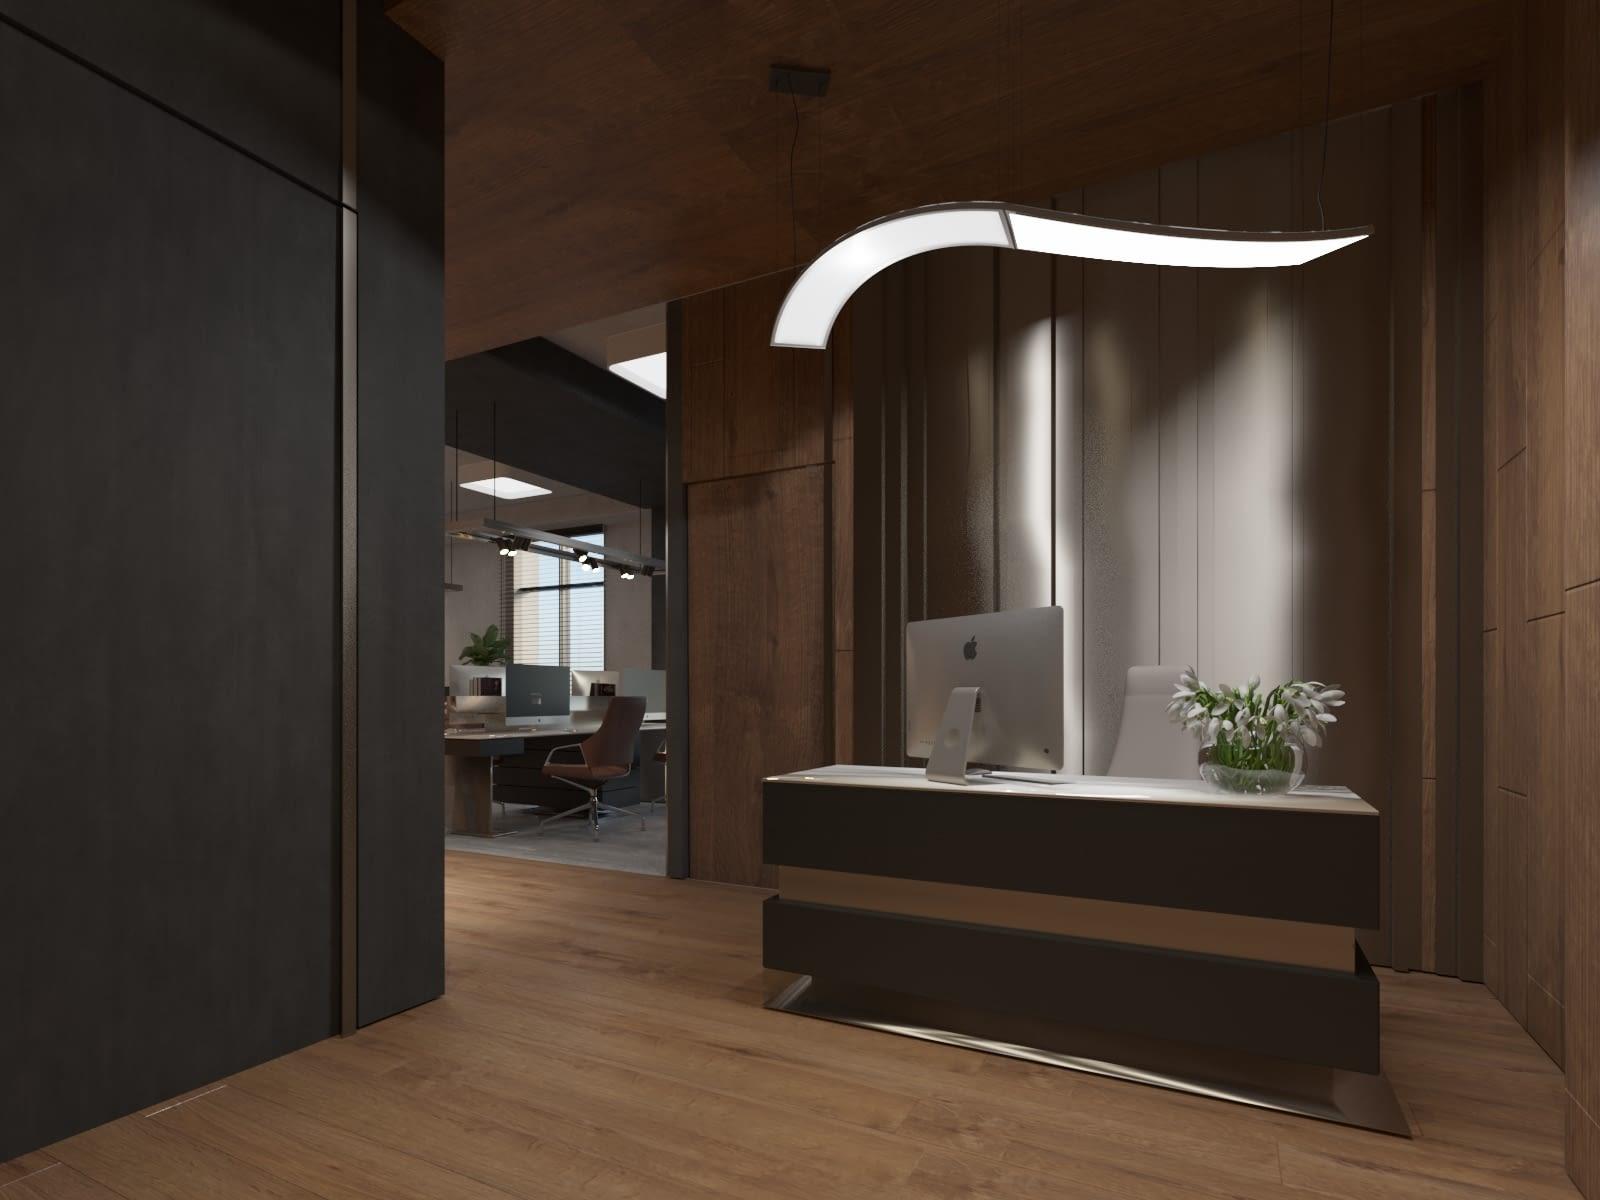 office1_Interactive LightMix_View05